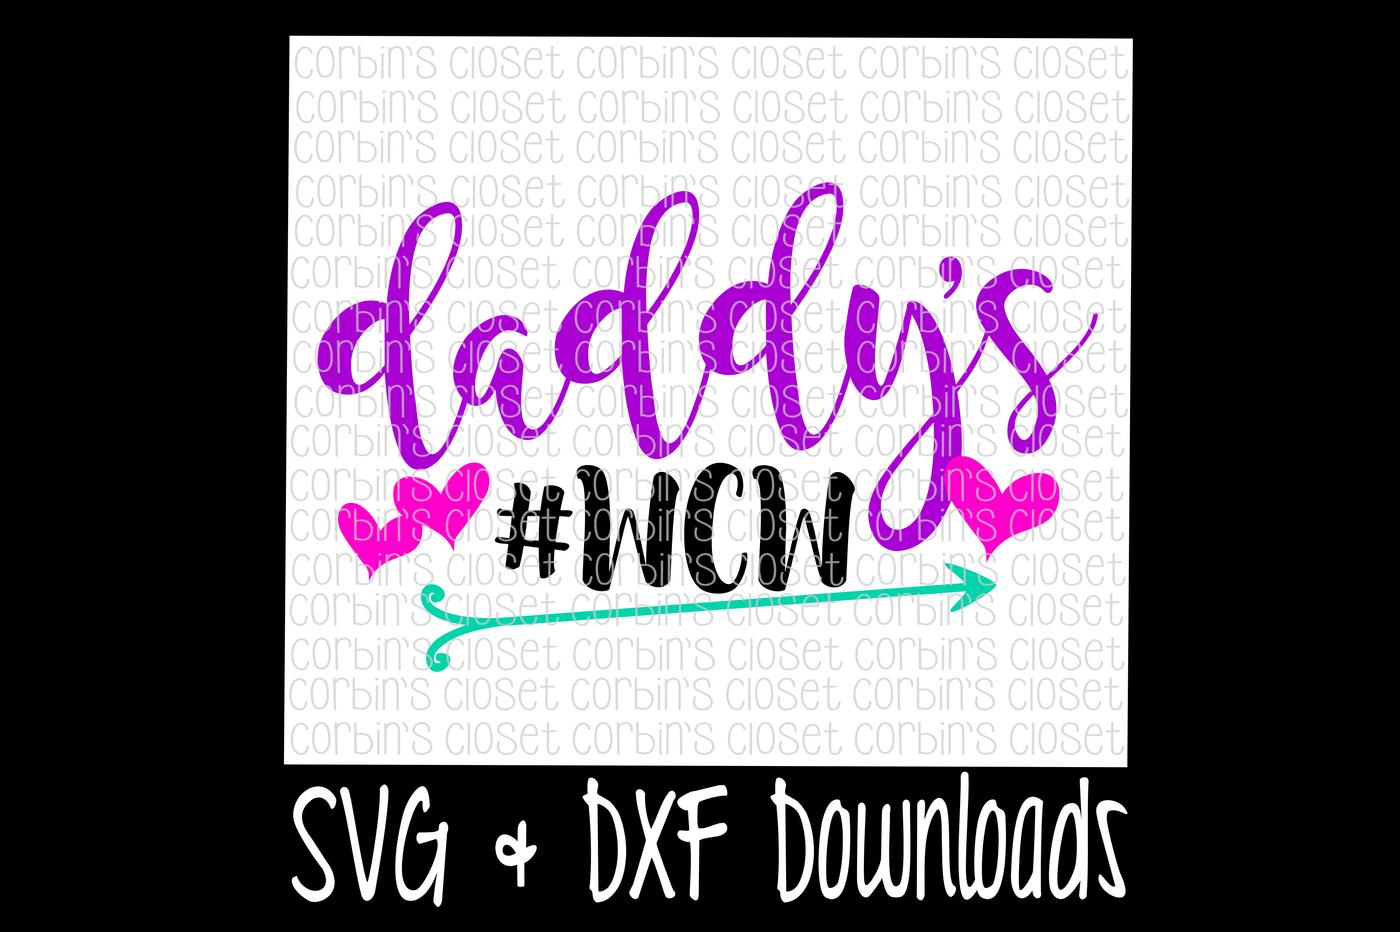 Daddys Girl Svg Daddy S Wcw Cut File By Corbins Svg